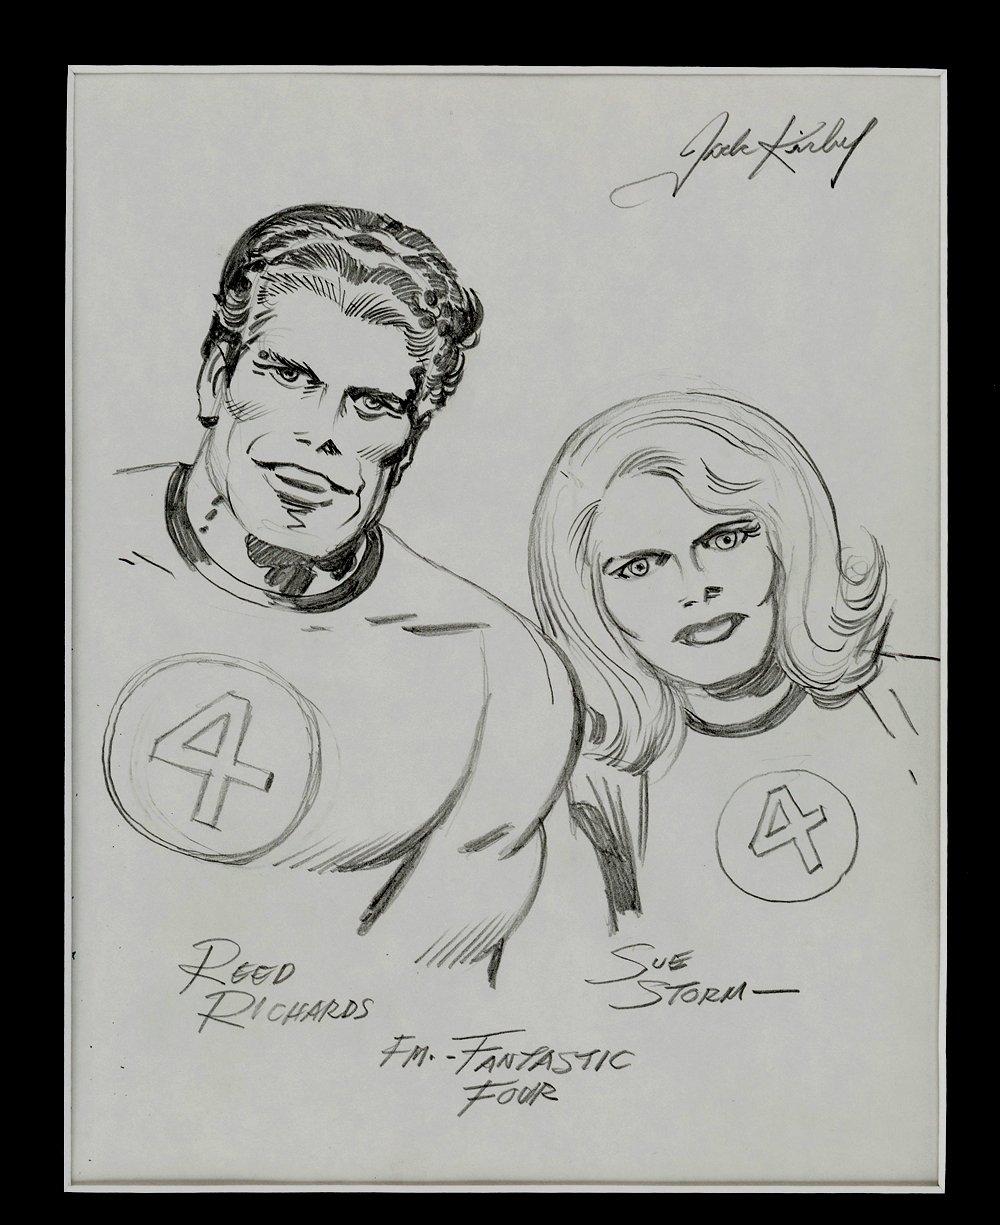 Mr Fantastic & Invisible Girl Pinup Published In Famed 'Heroes & Villains' Sketchbook (Early 1970's)